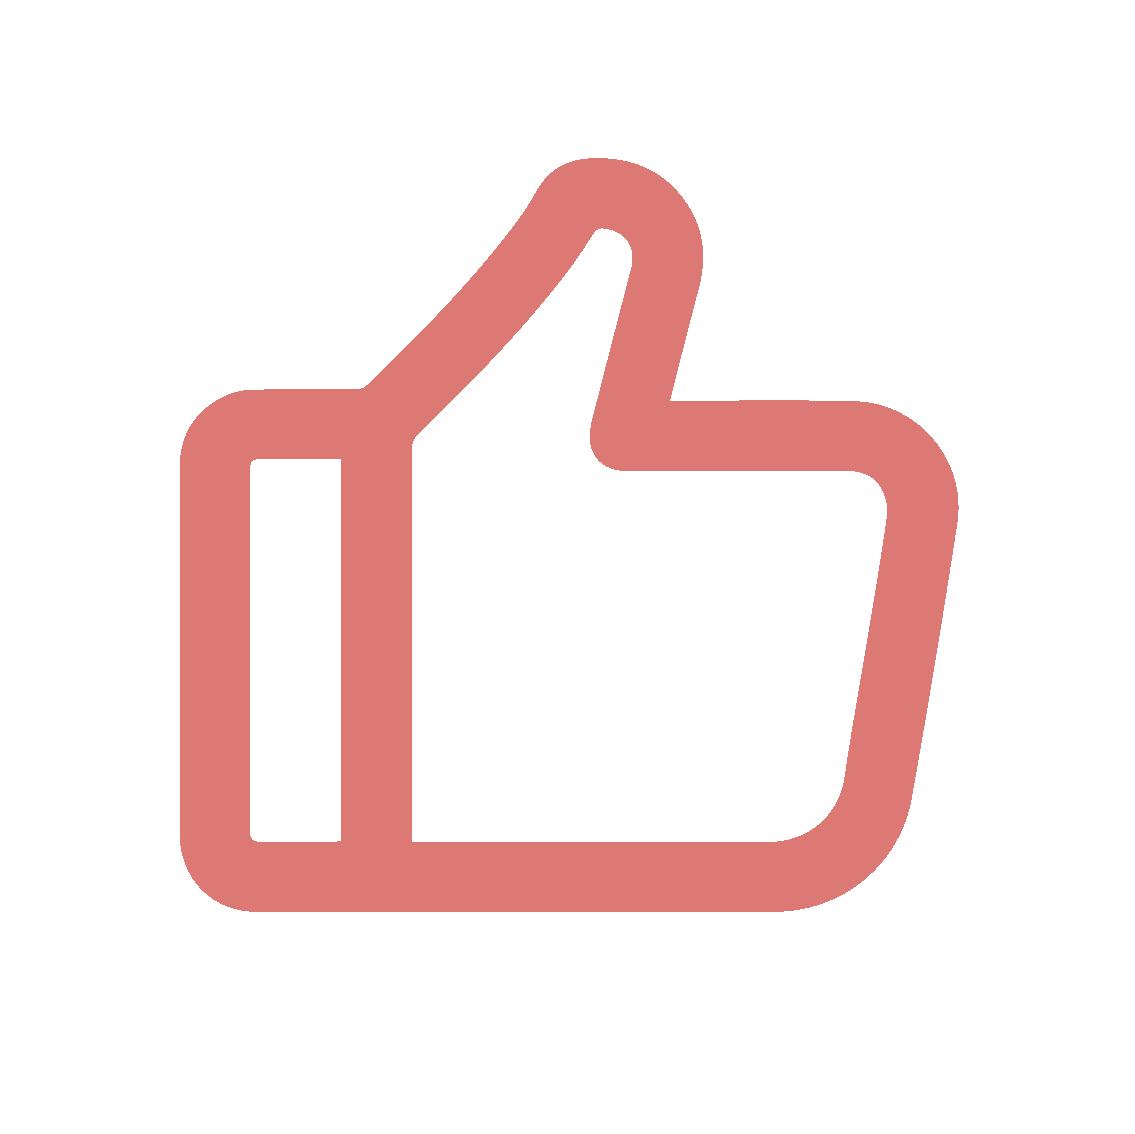 Operational_icon